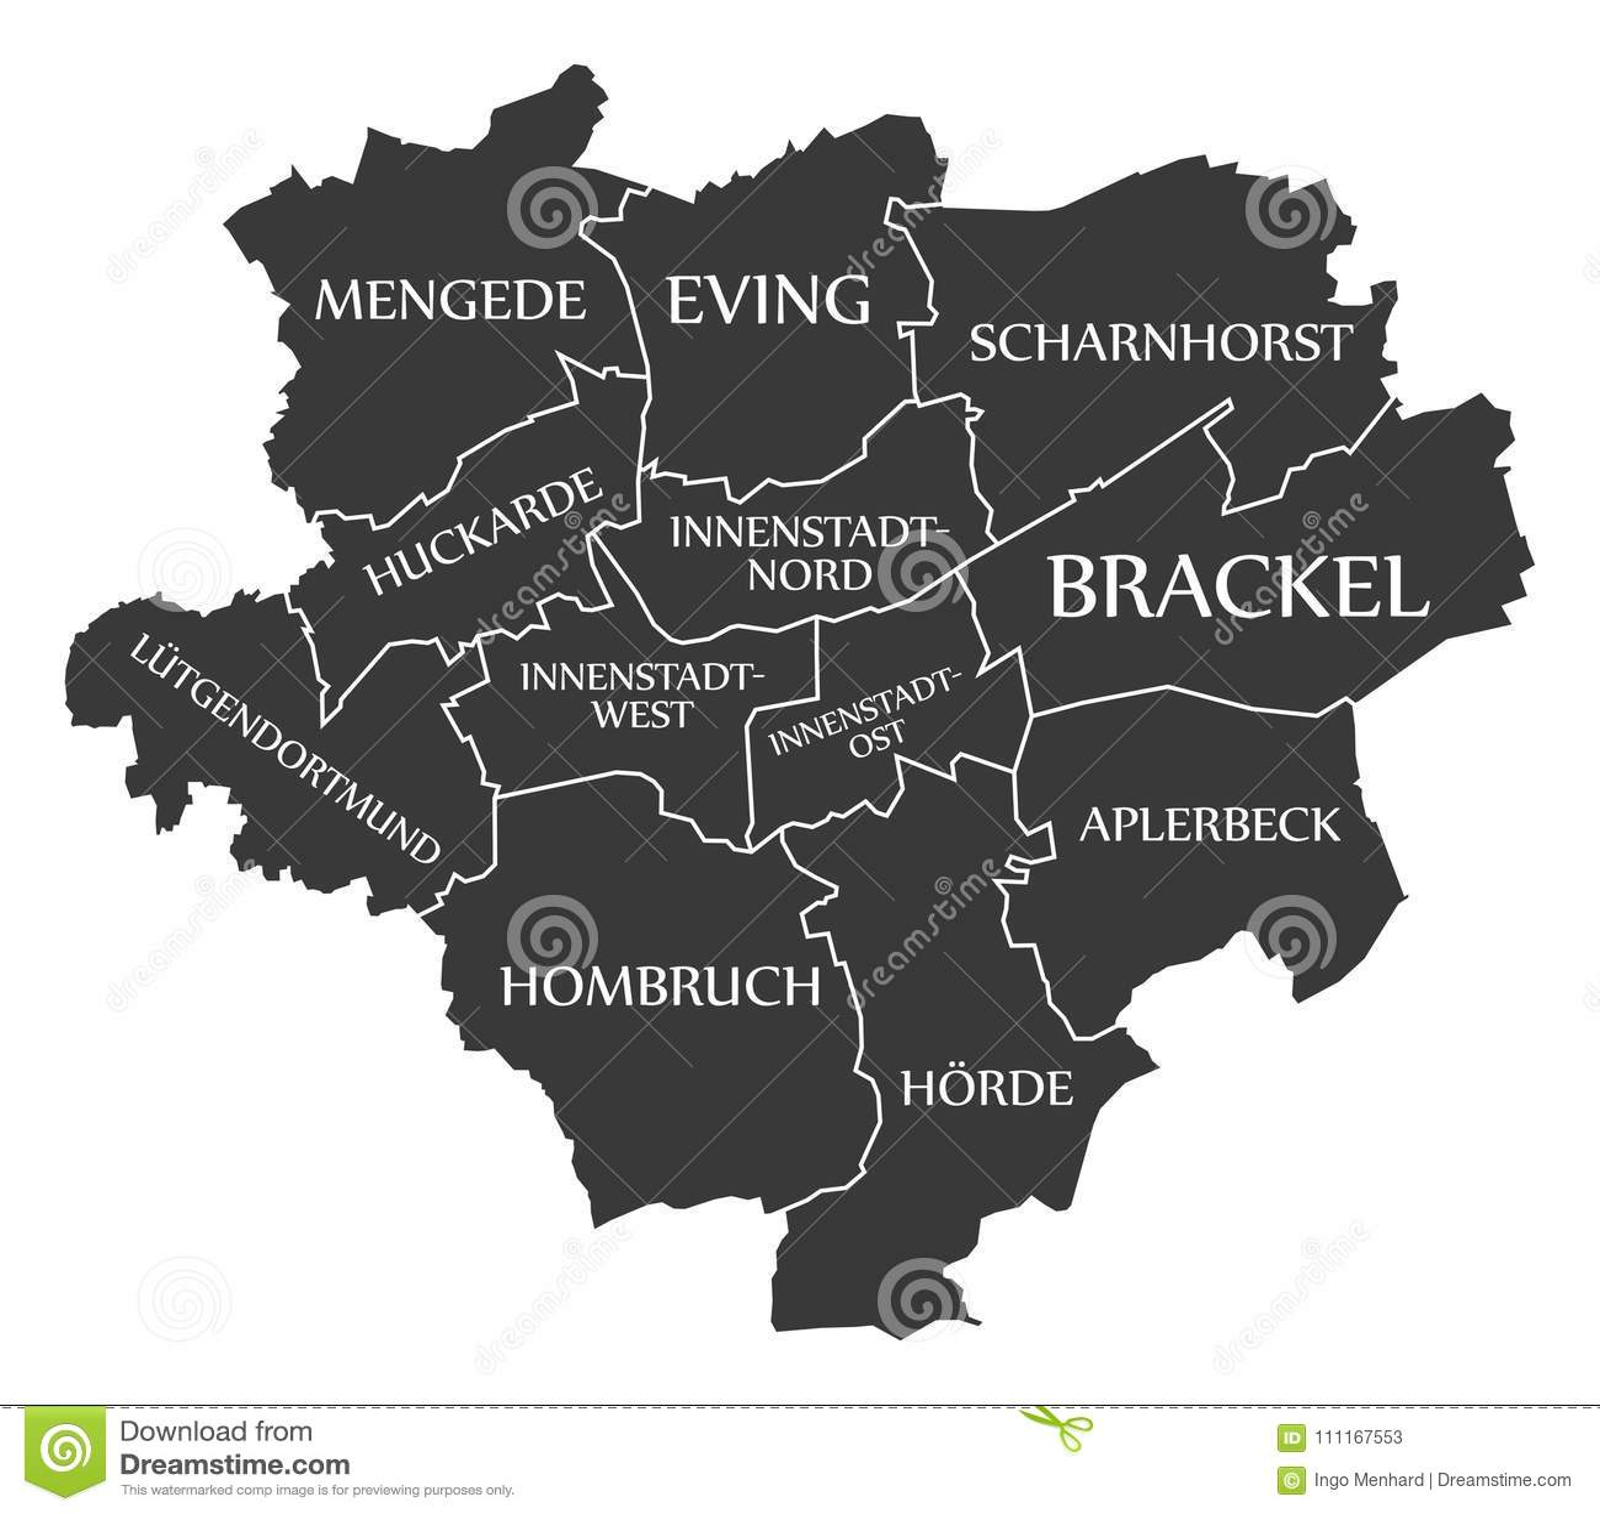 Dortmund On Map Of Germany.Dortmund City Map Germany De Labelled Black Illustration Stock